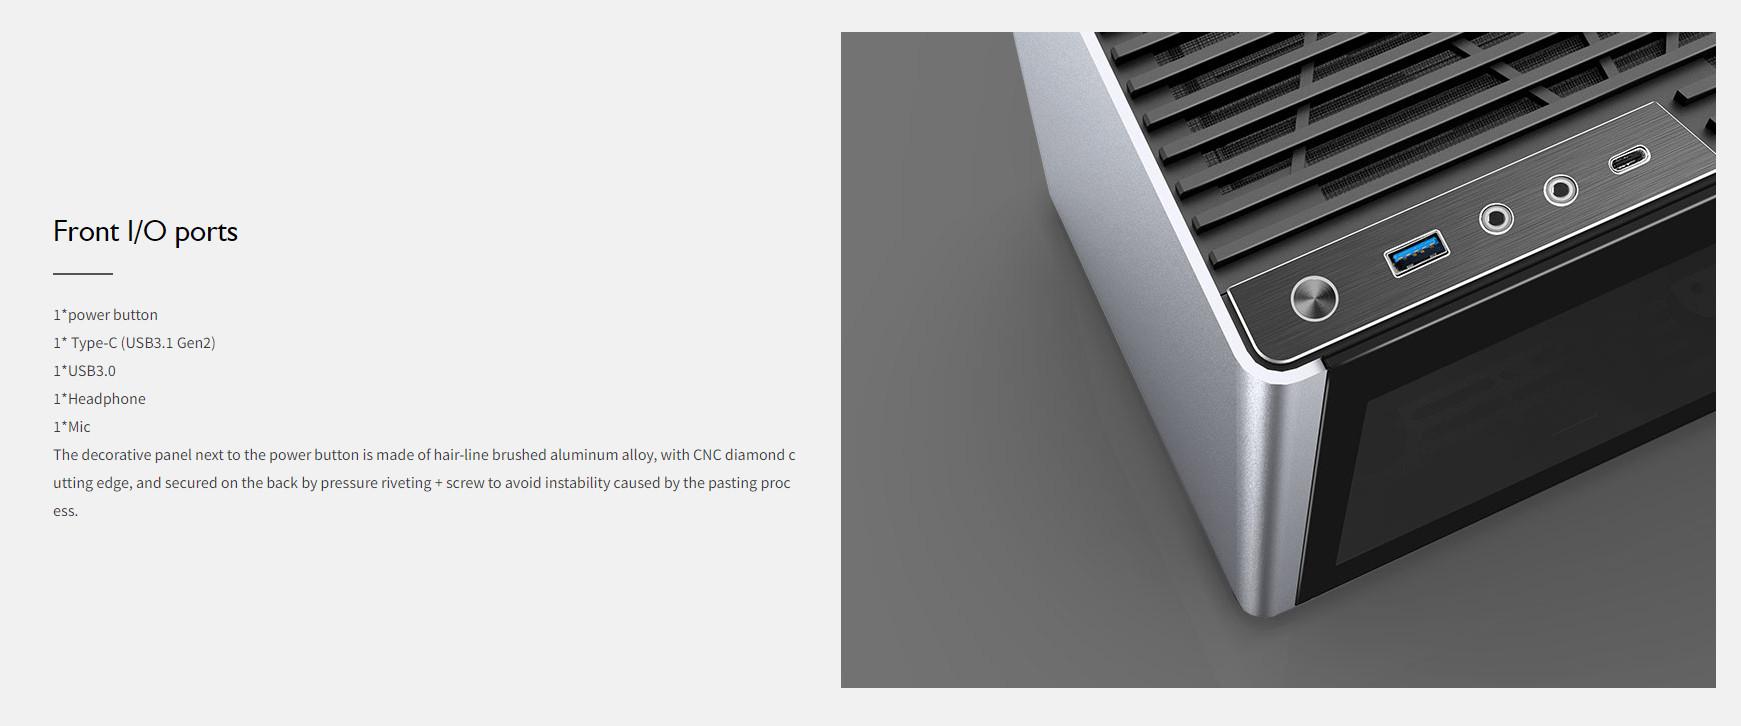 Case JonsboPlus  i100-G Silver  (Mini Tower/Màu Bạc) giới thiệu 4